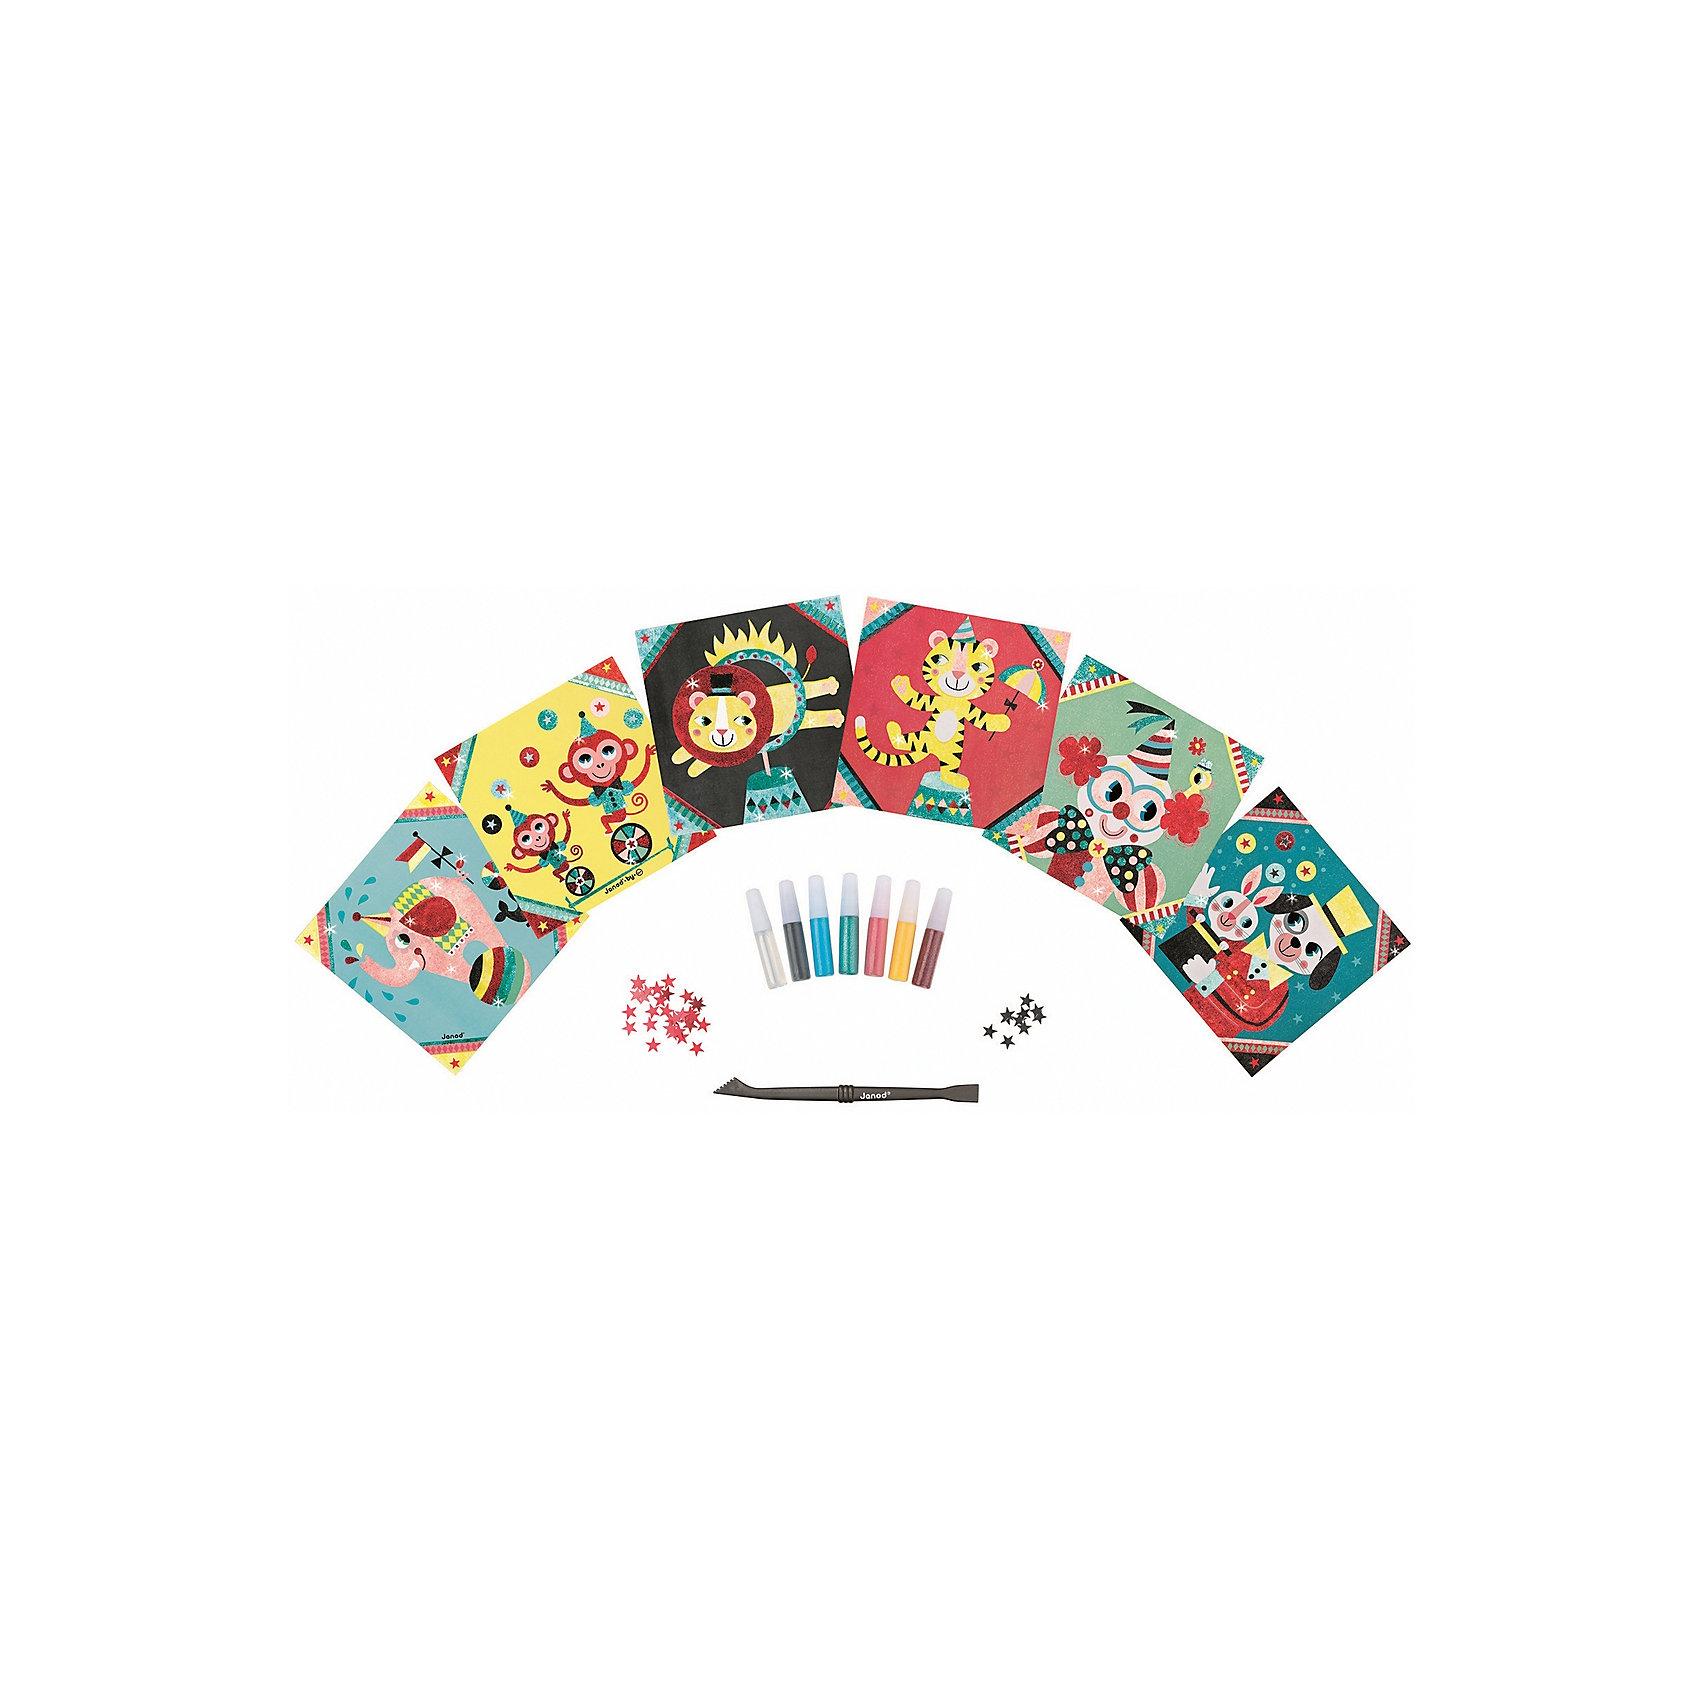 Janod Набор для творчества: посыпаем блестками Цирк, 6 карточек janod пазл я мама 4 в 1